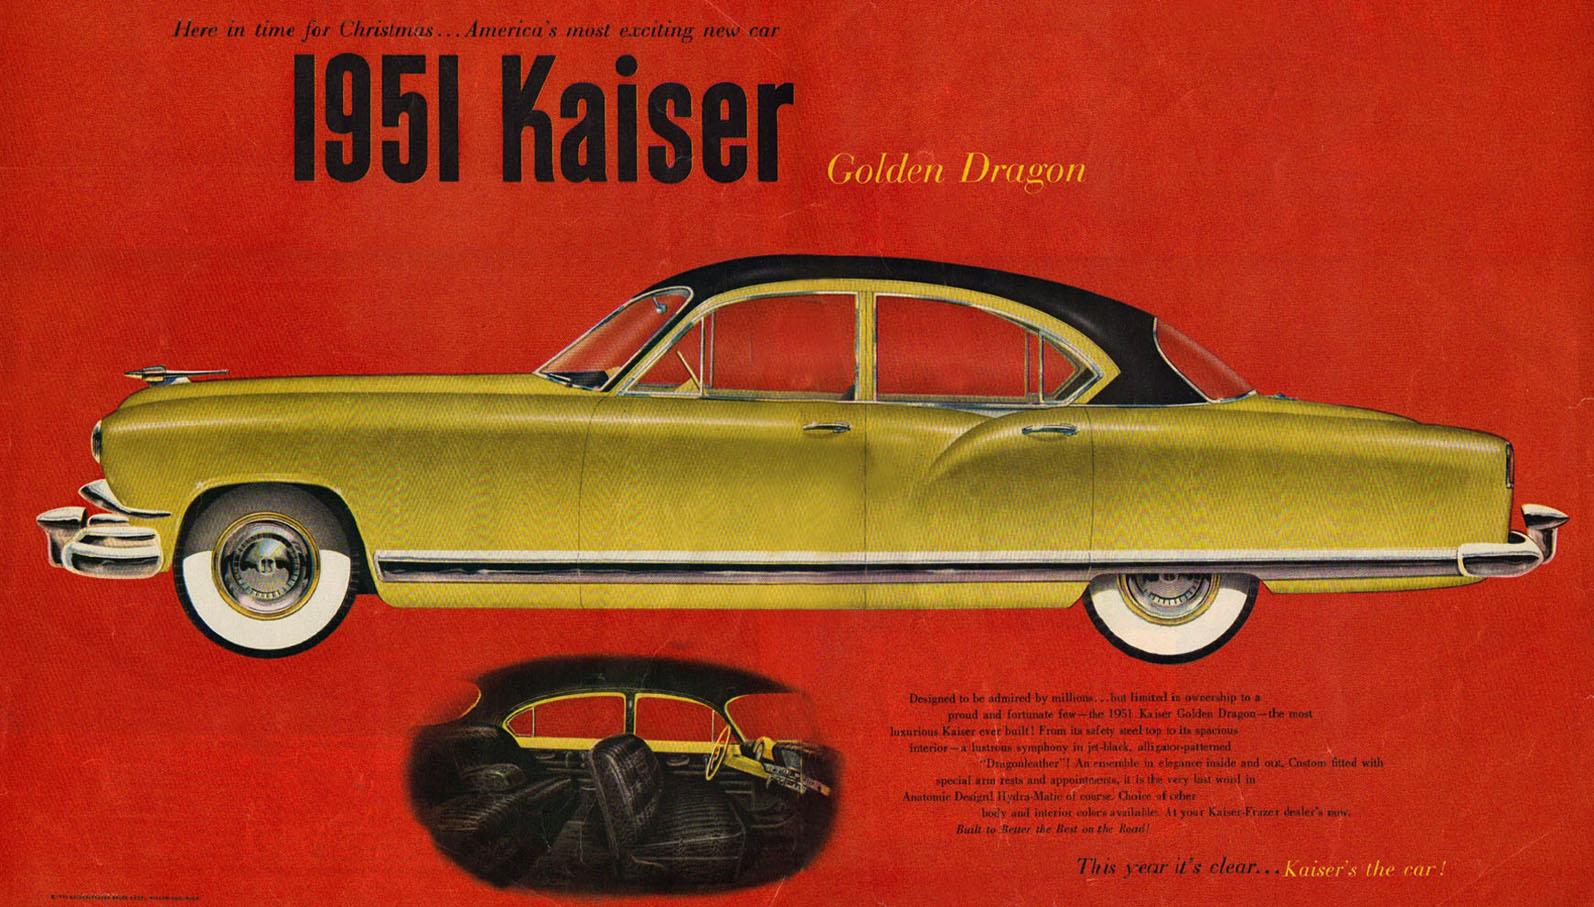 1951 Kaiser Ad-02.